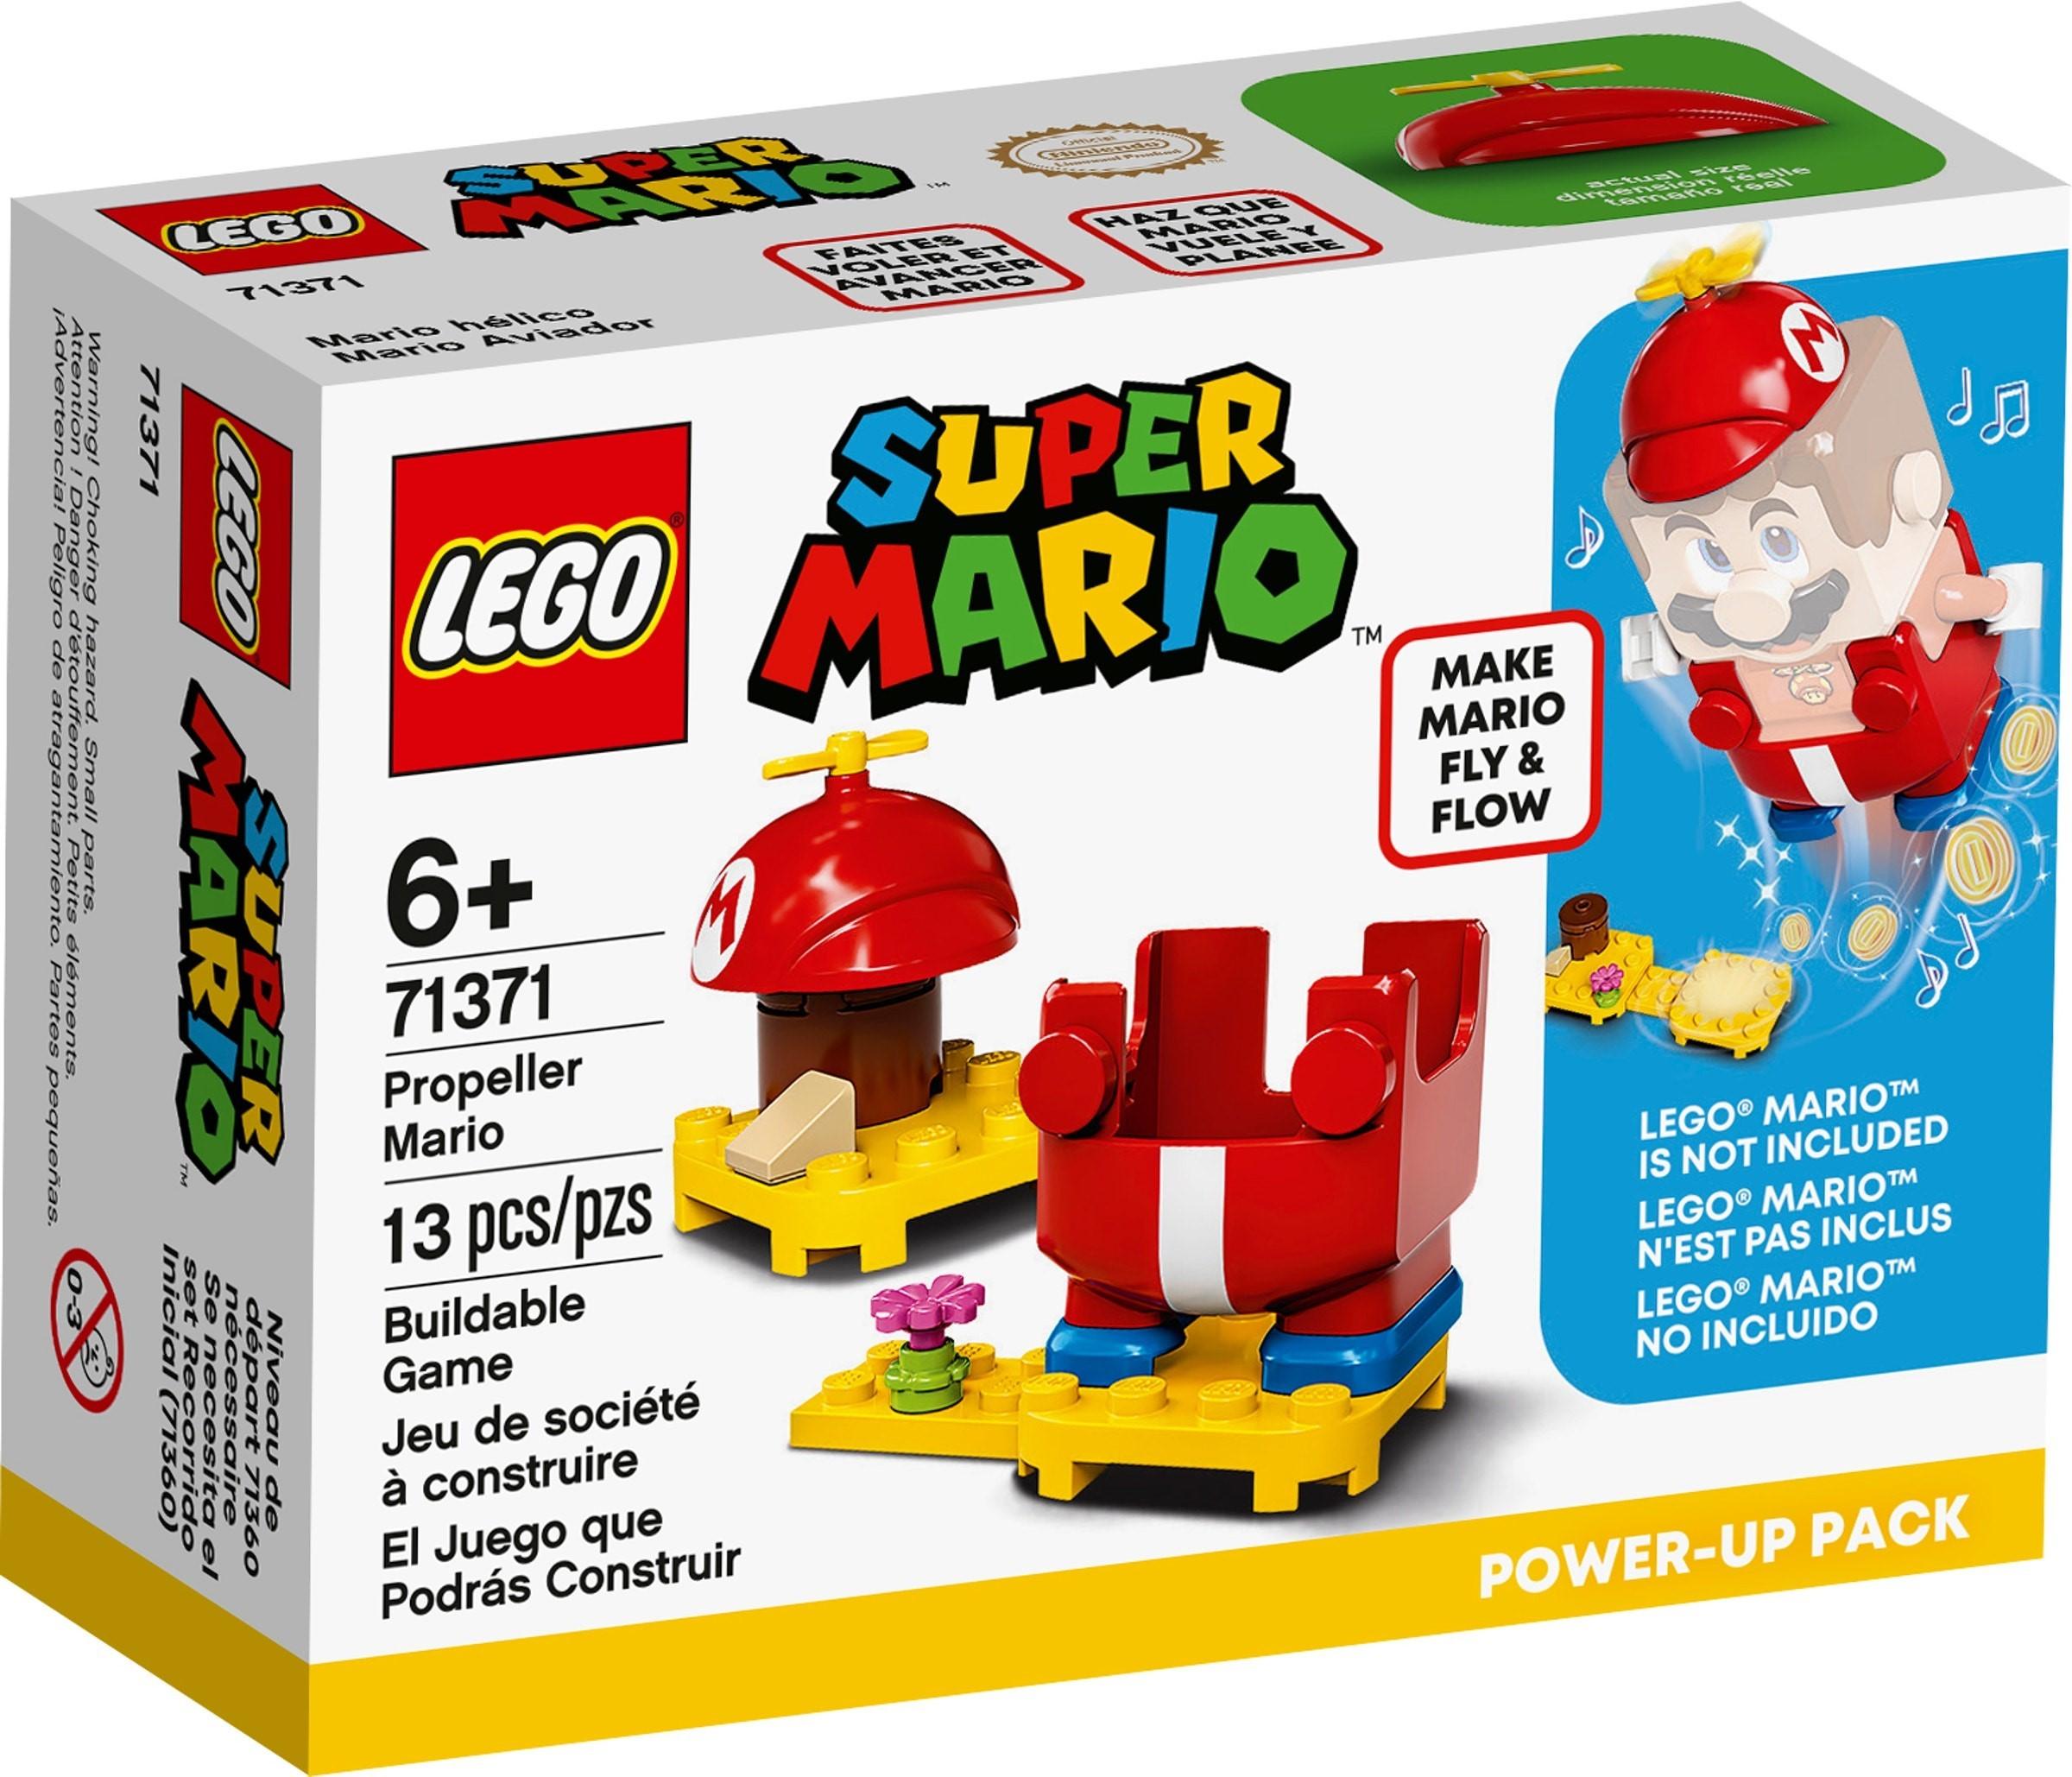 71371 Propeller Mario Power-Up Pack